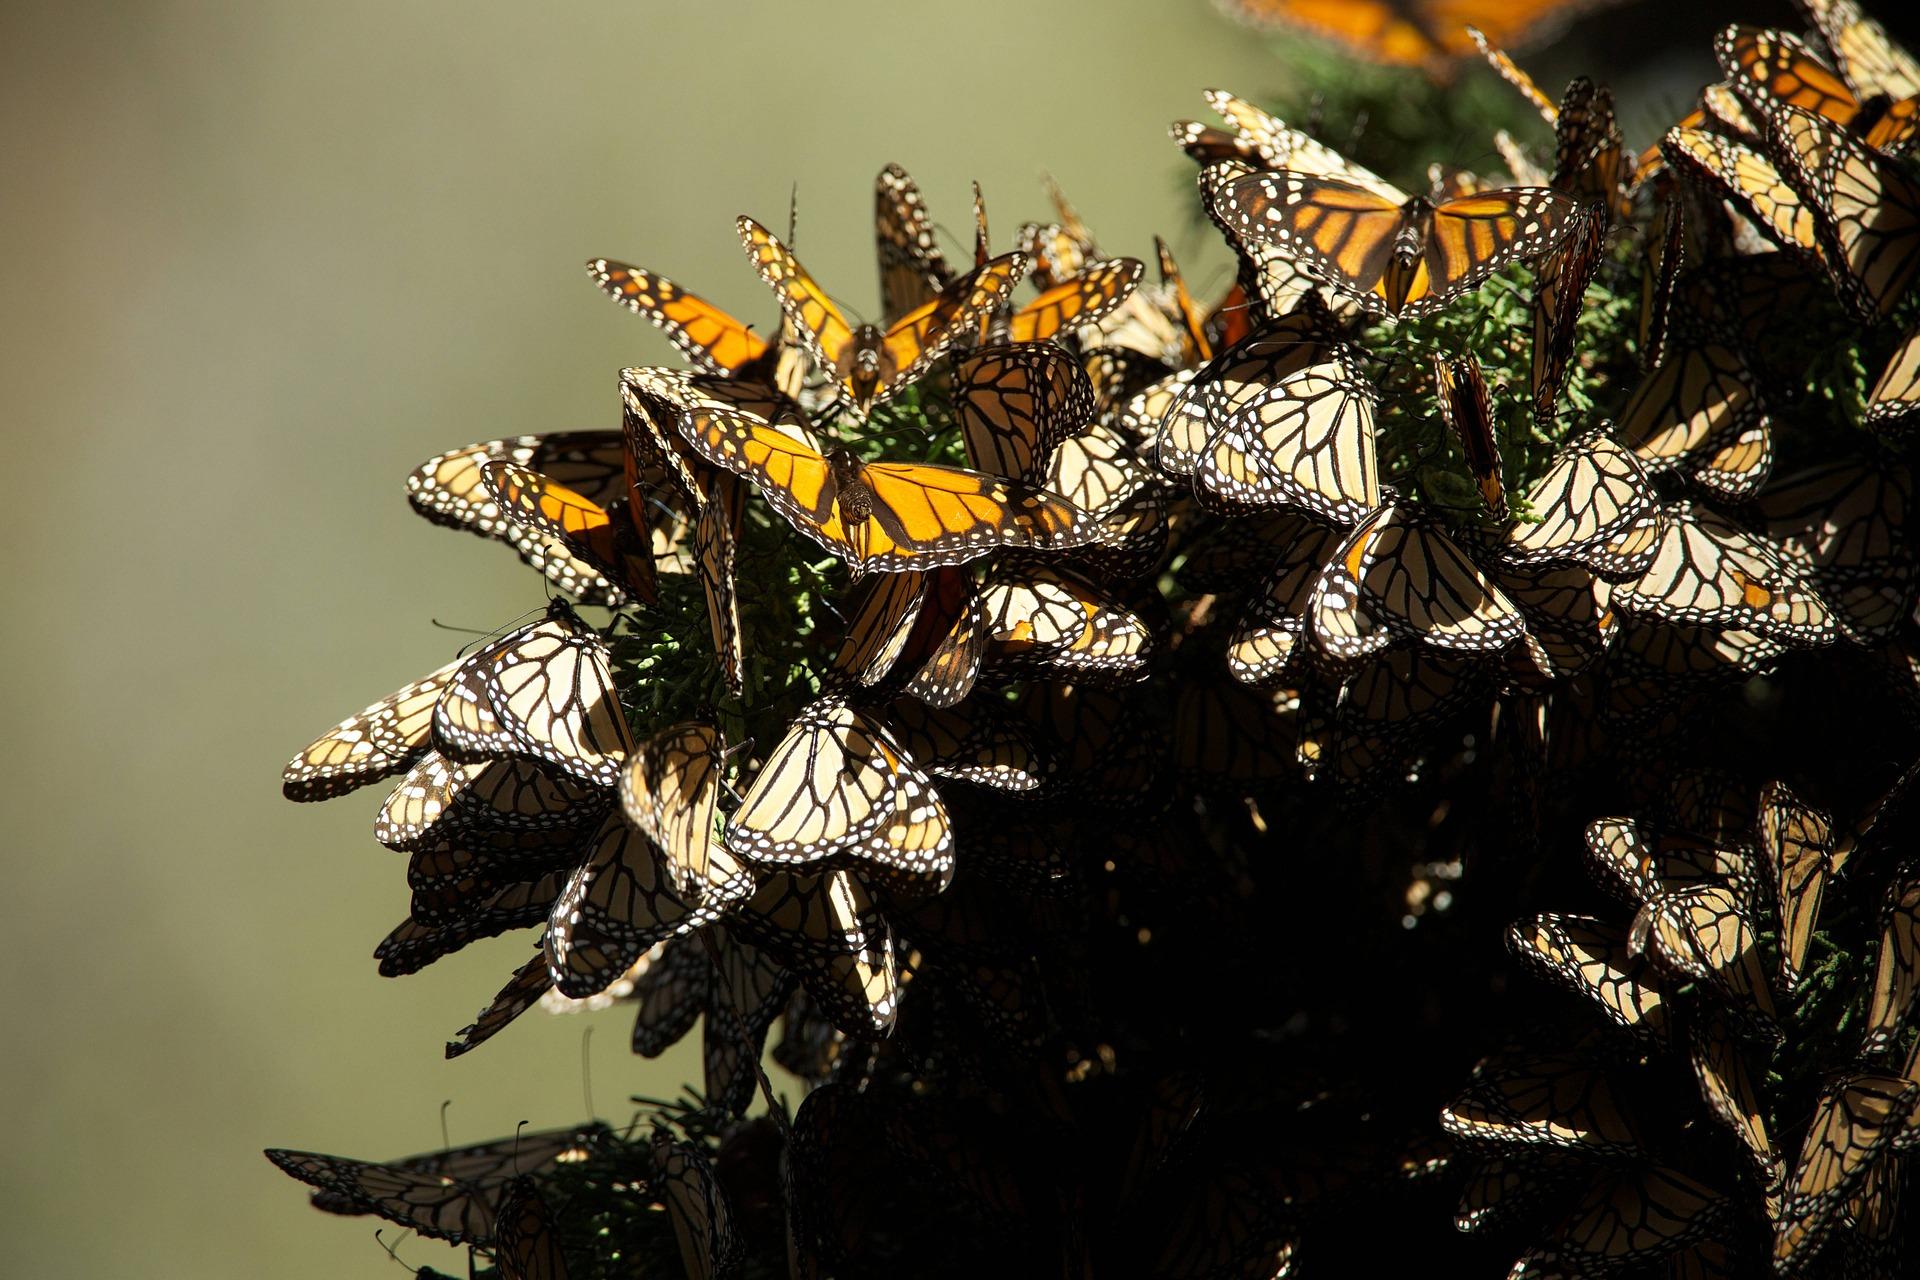 Santuario de la Mariposa Monarca podría cerrar por Coronavirus